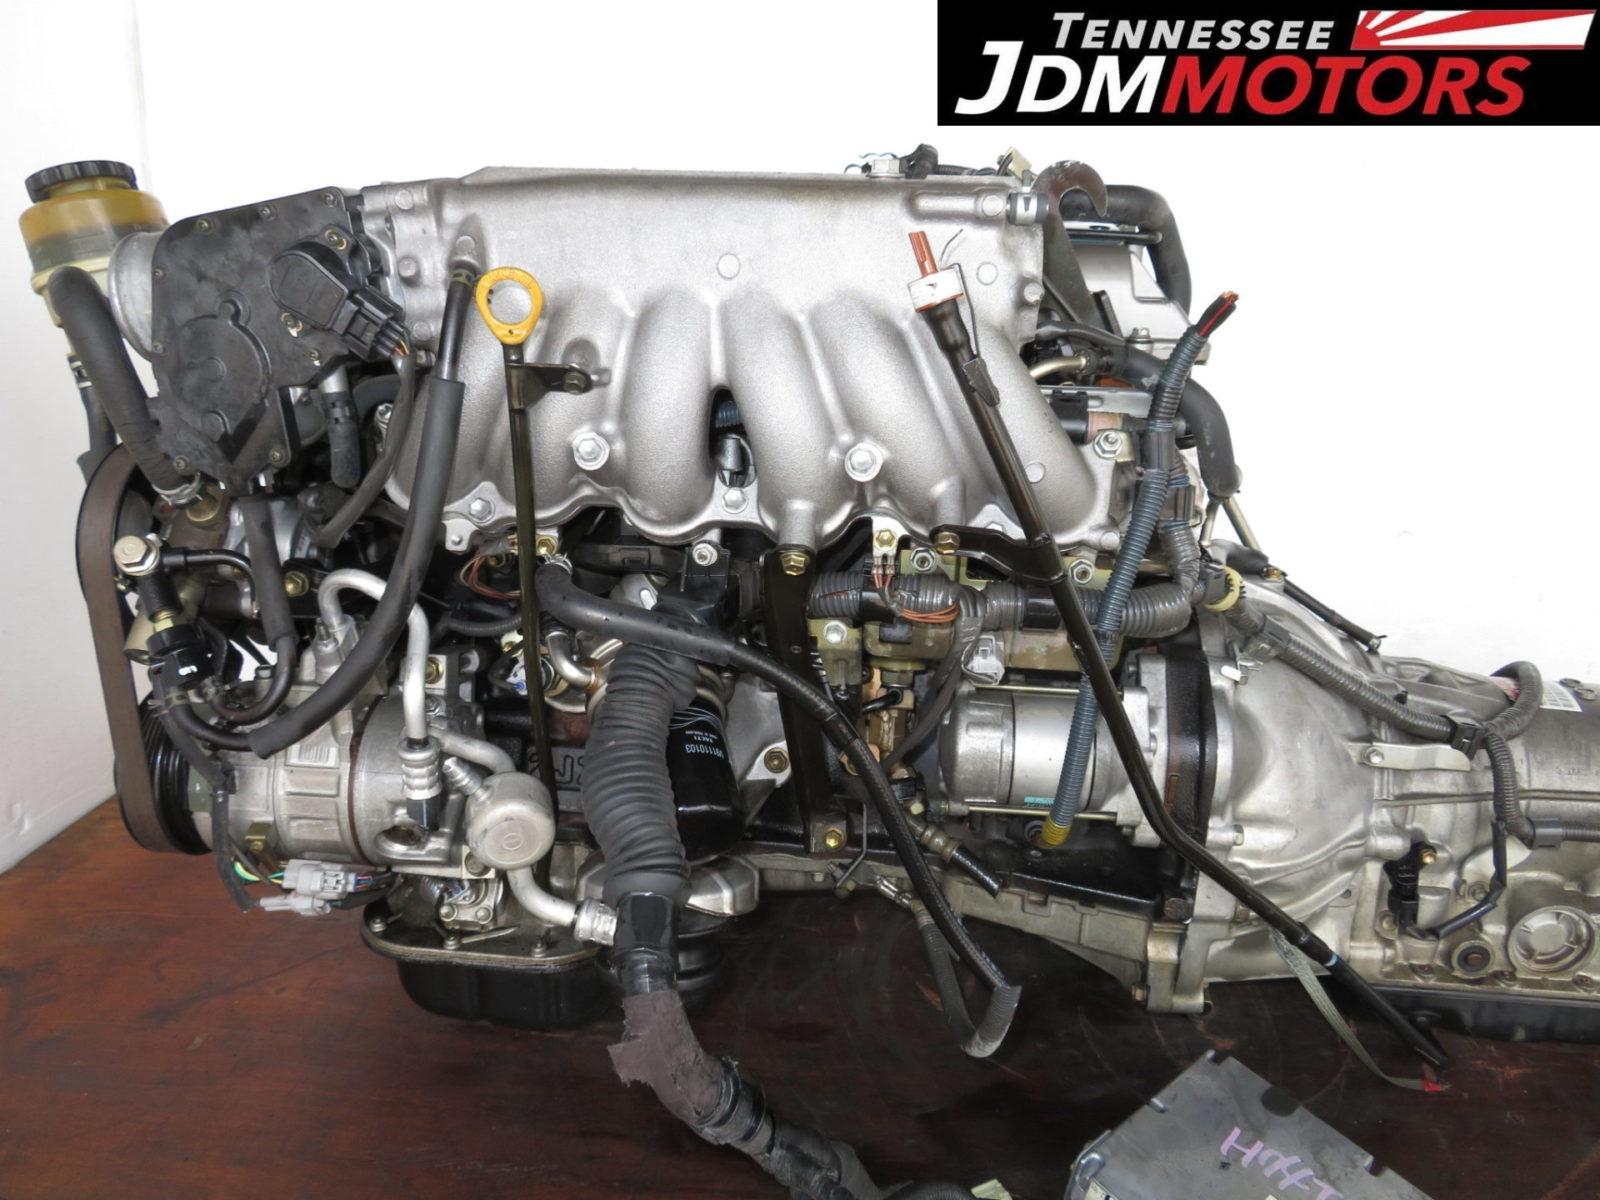 JDM 2JZ-GTE TOYOTA ARISTO SUPRA SC300 TWIN TURBO VVTI ...